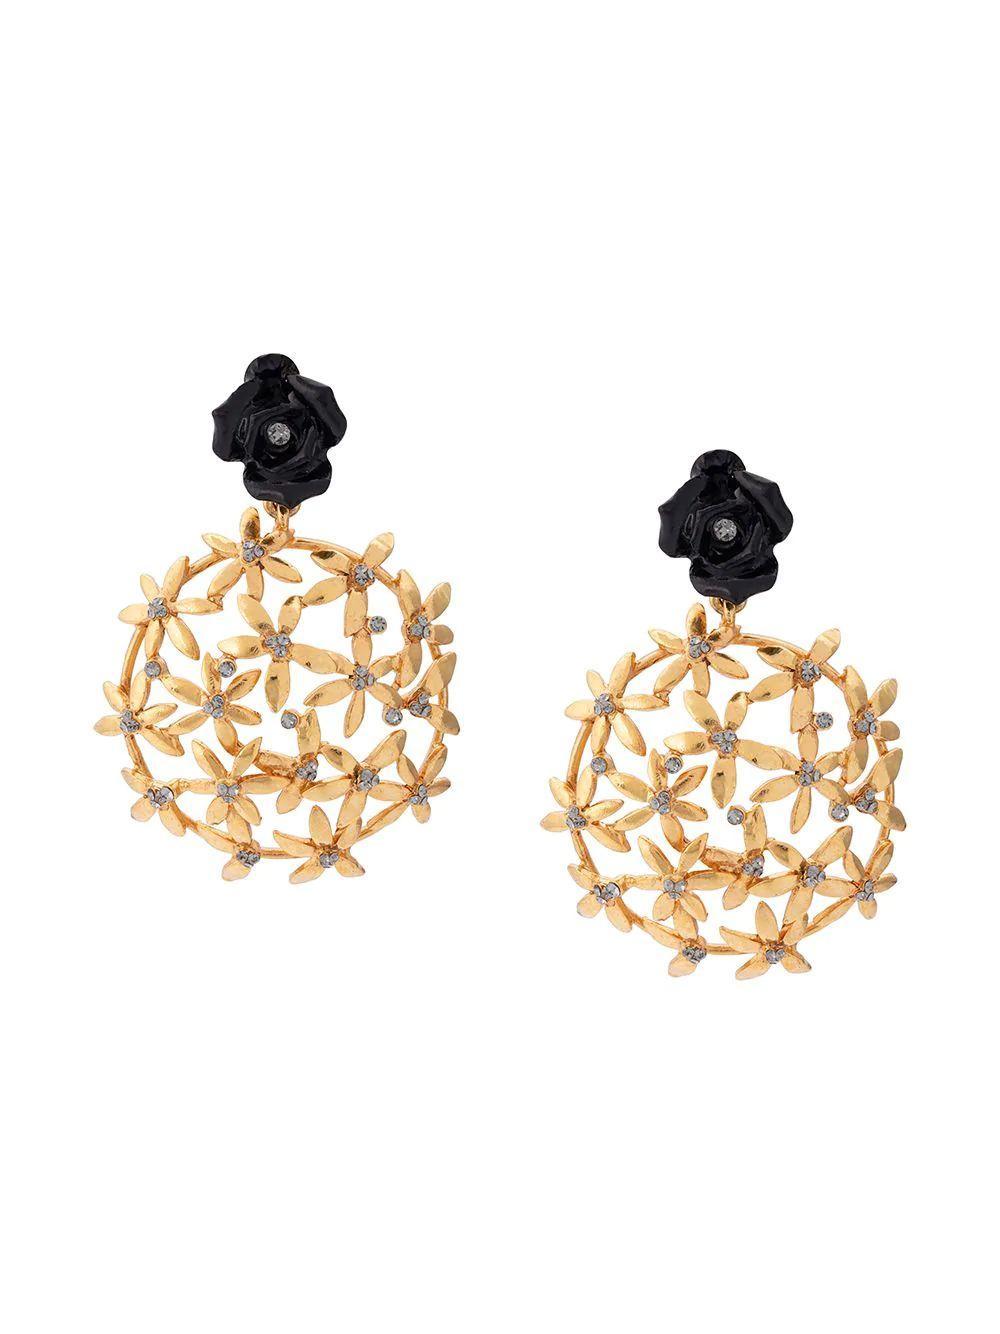 Resin Rose With Flower Cluster Clip Earring Item # R20J125